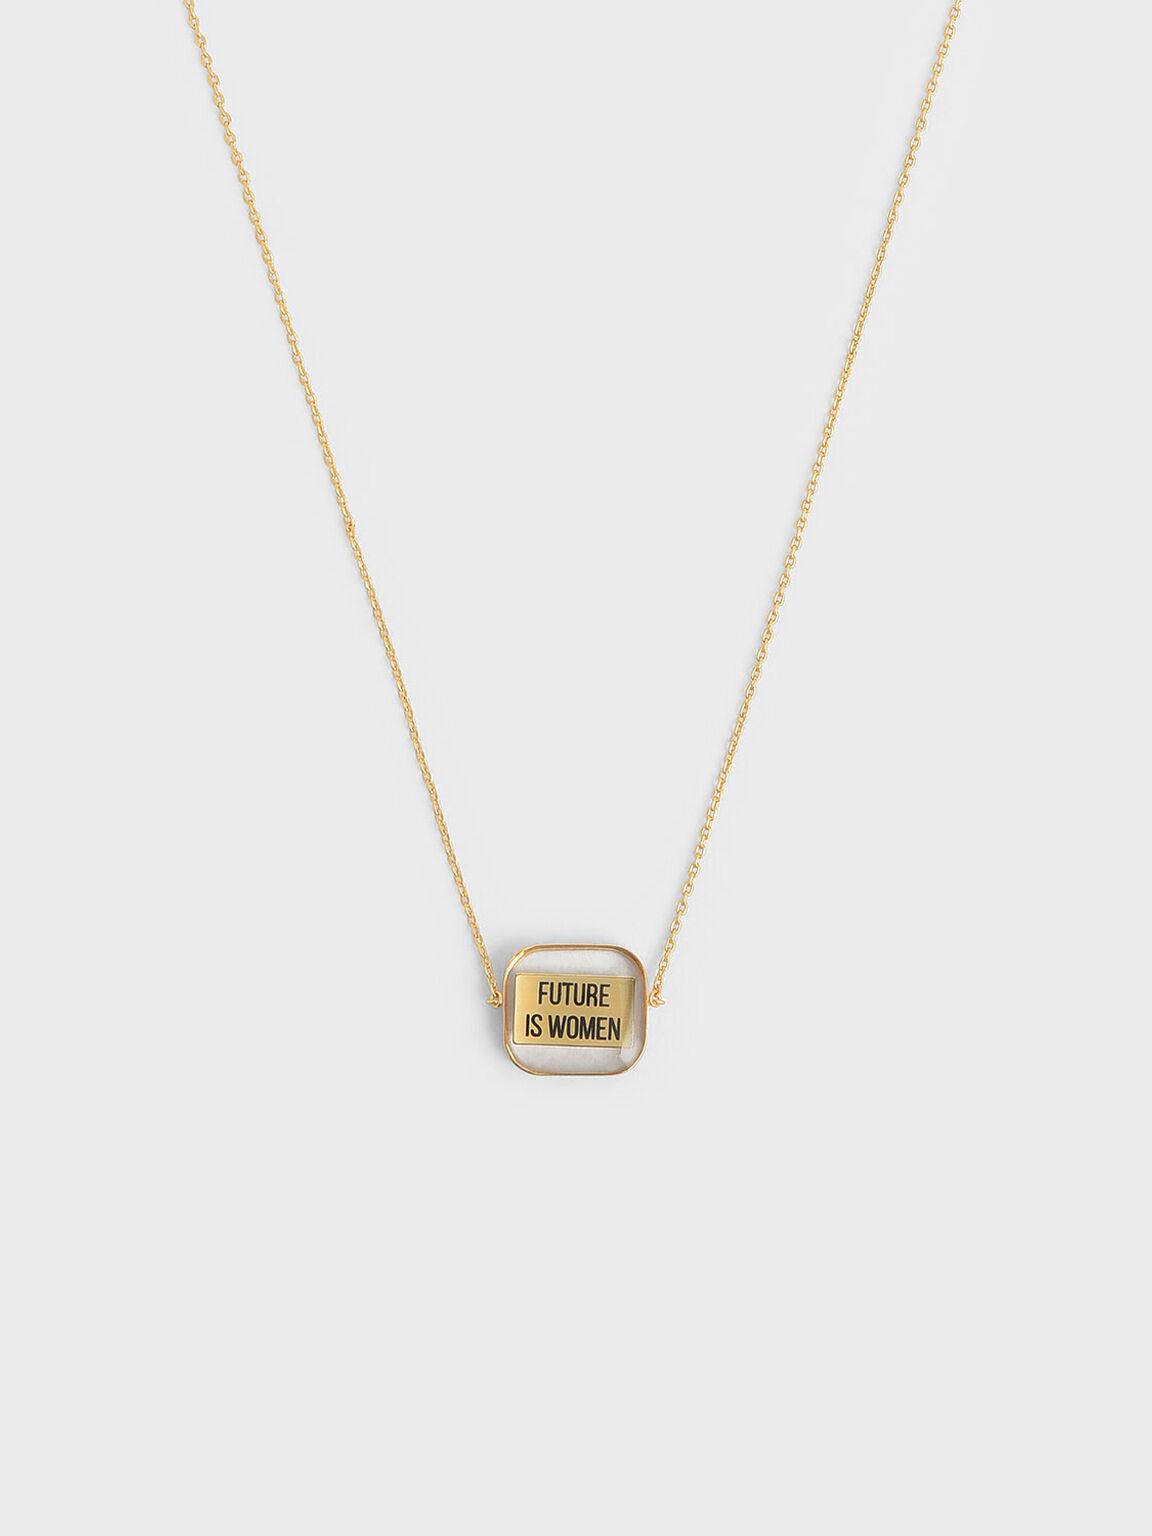 "FUTURE IS WOMEN"" Acrylic Necklace"", Bronze, hi-res"